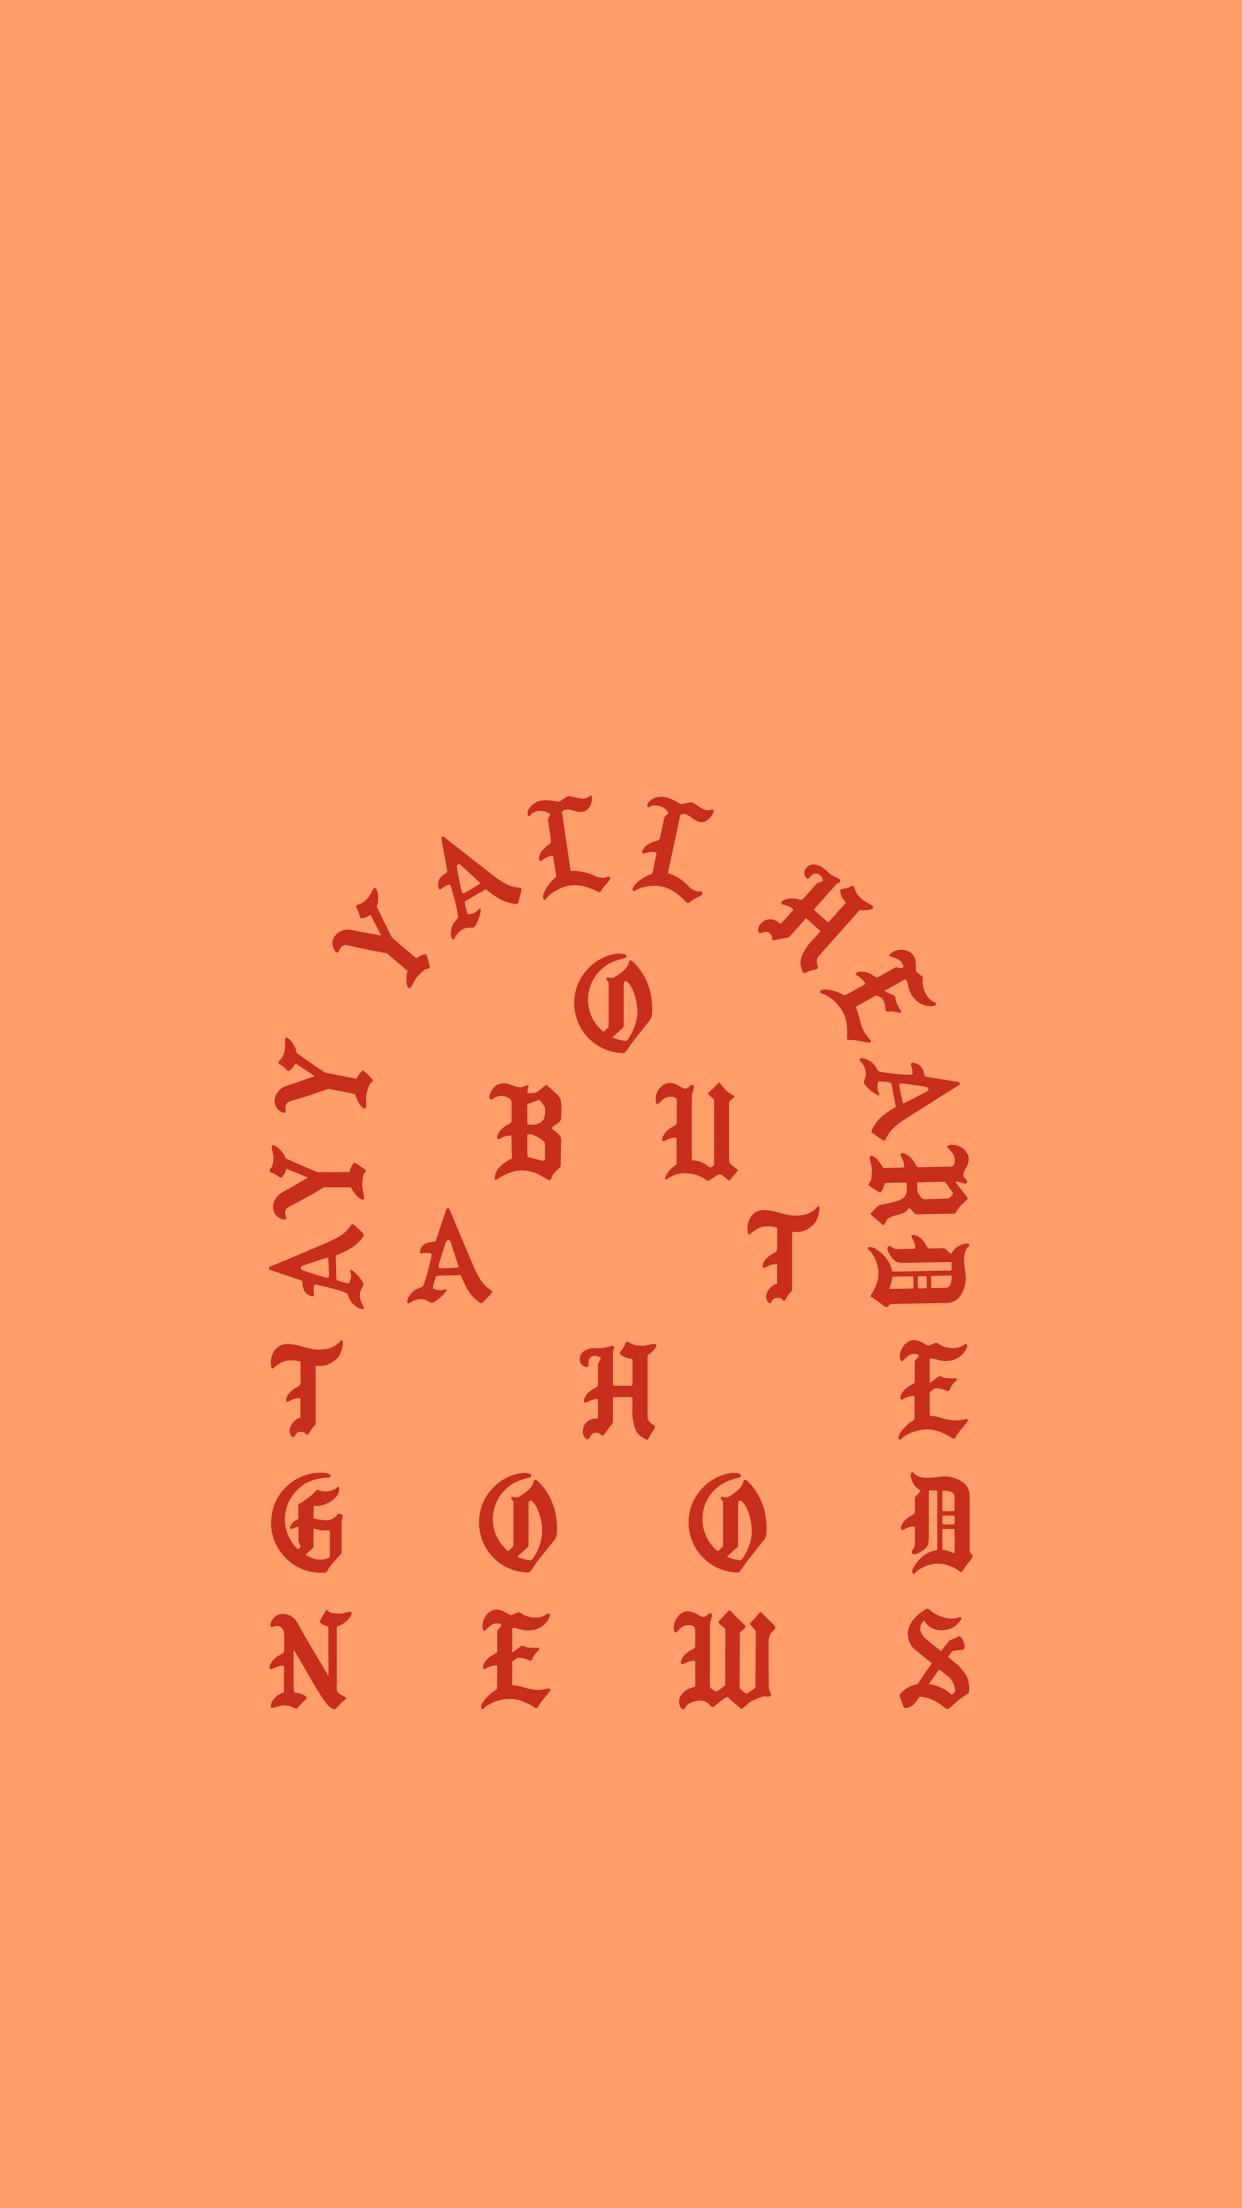 Kanye West Wallpaper EyeOfTrueWorlds